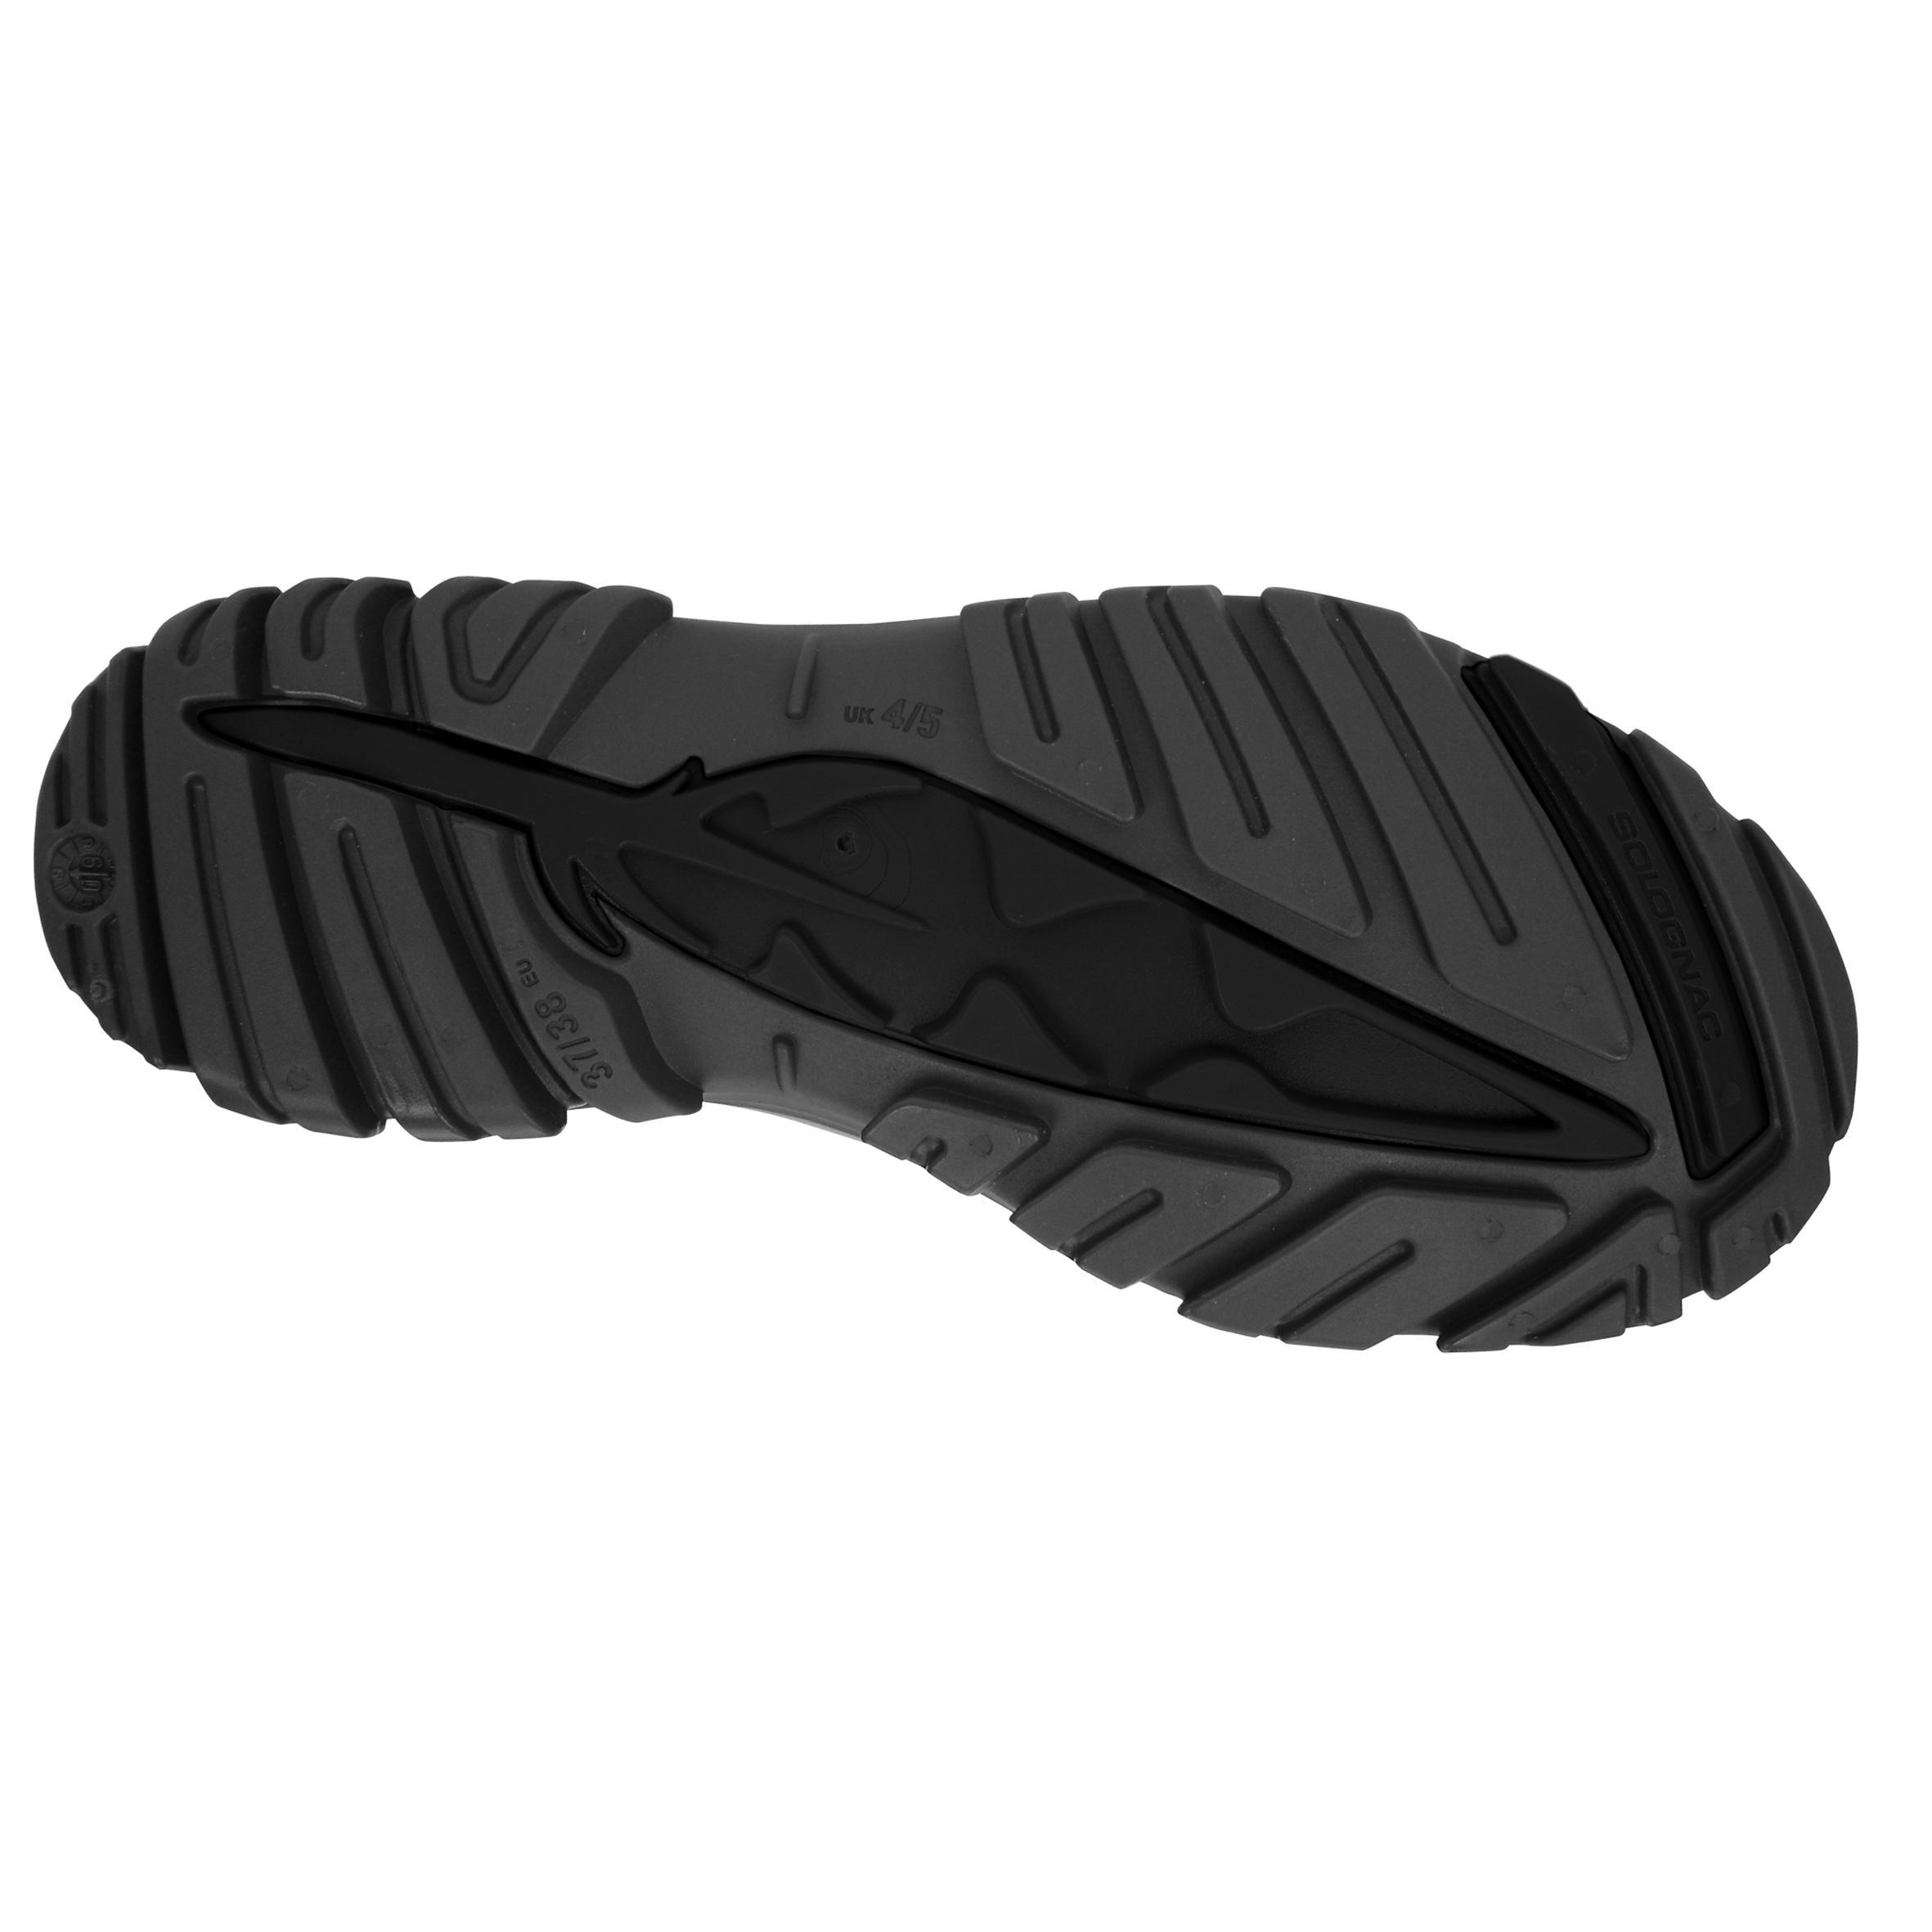 Inverness 100 Men's Ankle Boots - Black